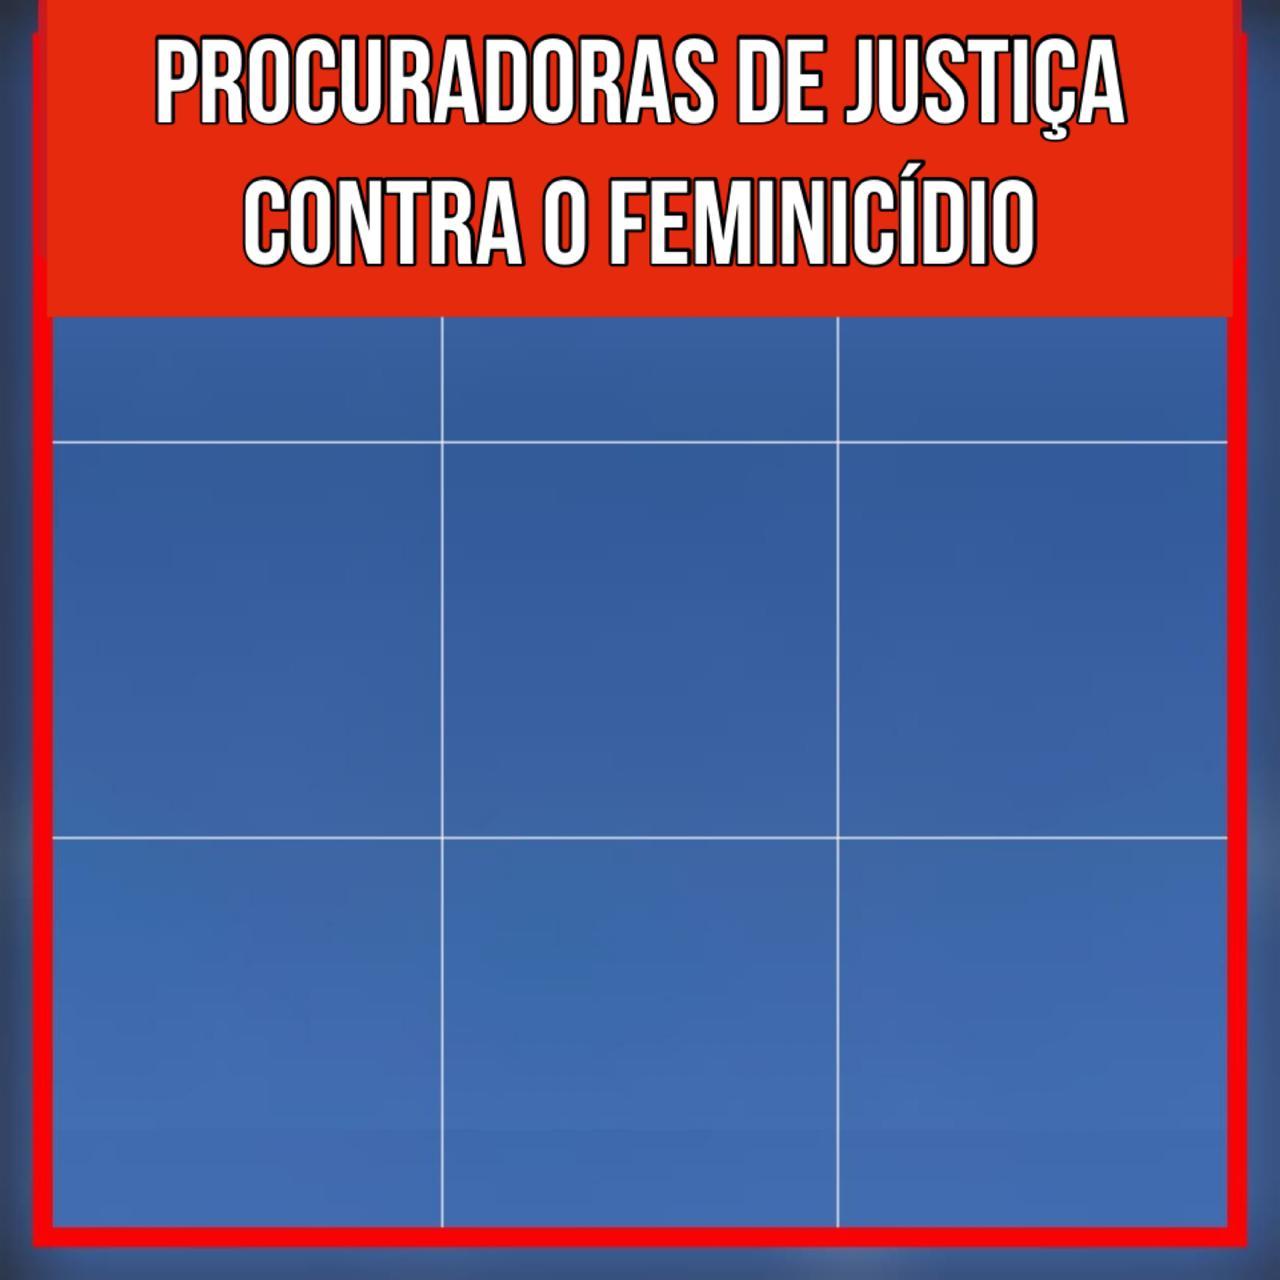 procuradoras_feminicidio.jpeg